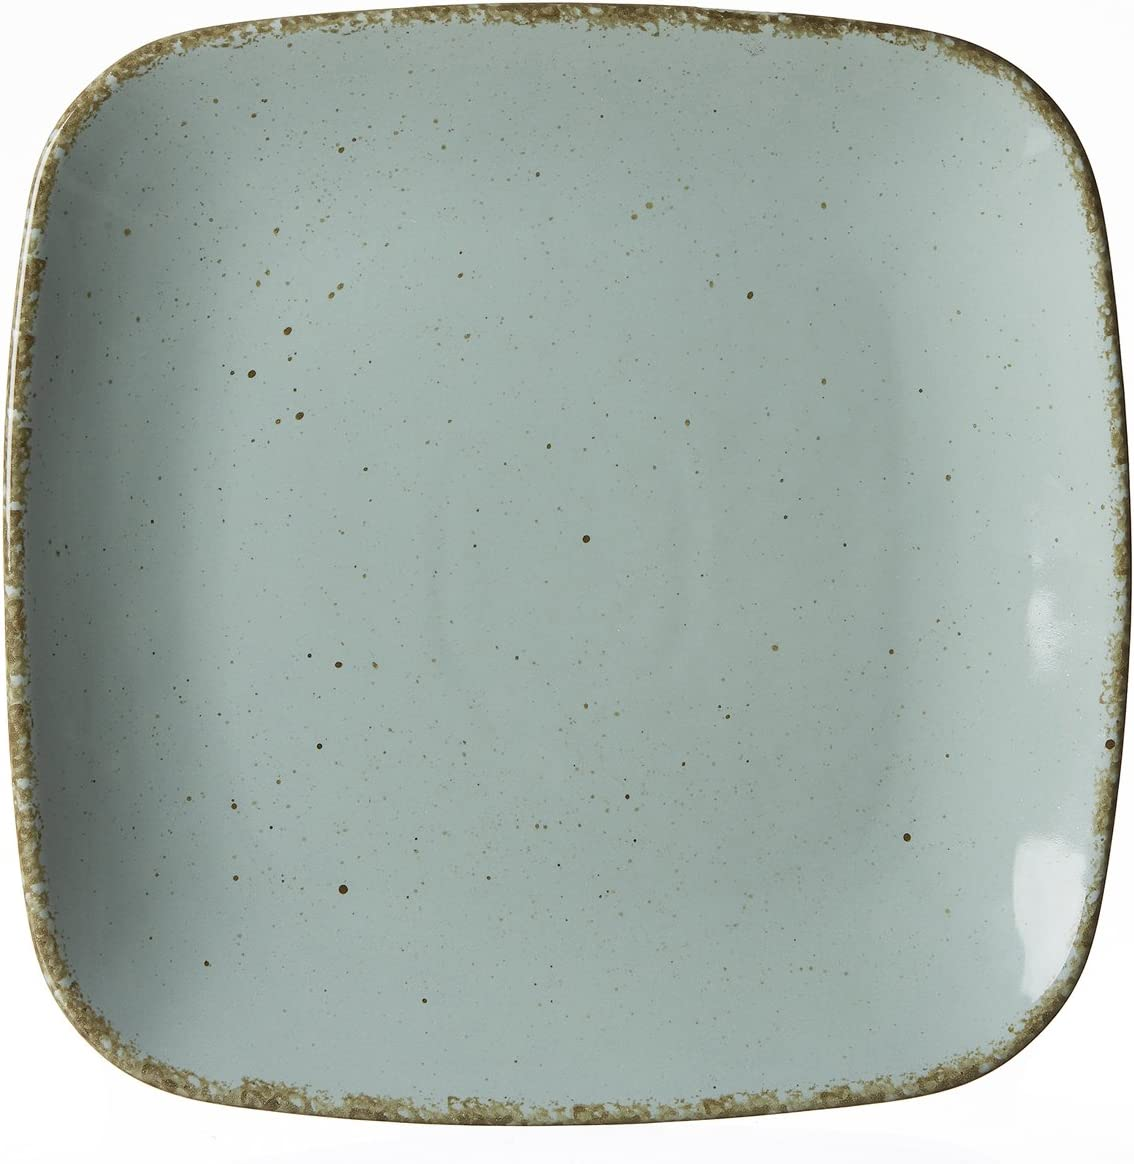 colore: Blu 10 x 10 cm Set di 6 ciotole per salse Ritzenhoff /& Breker Casa